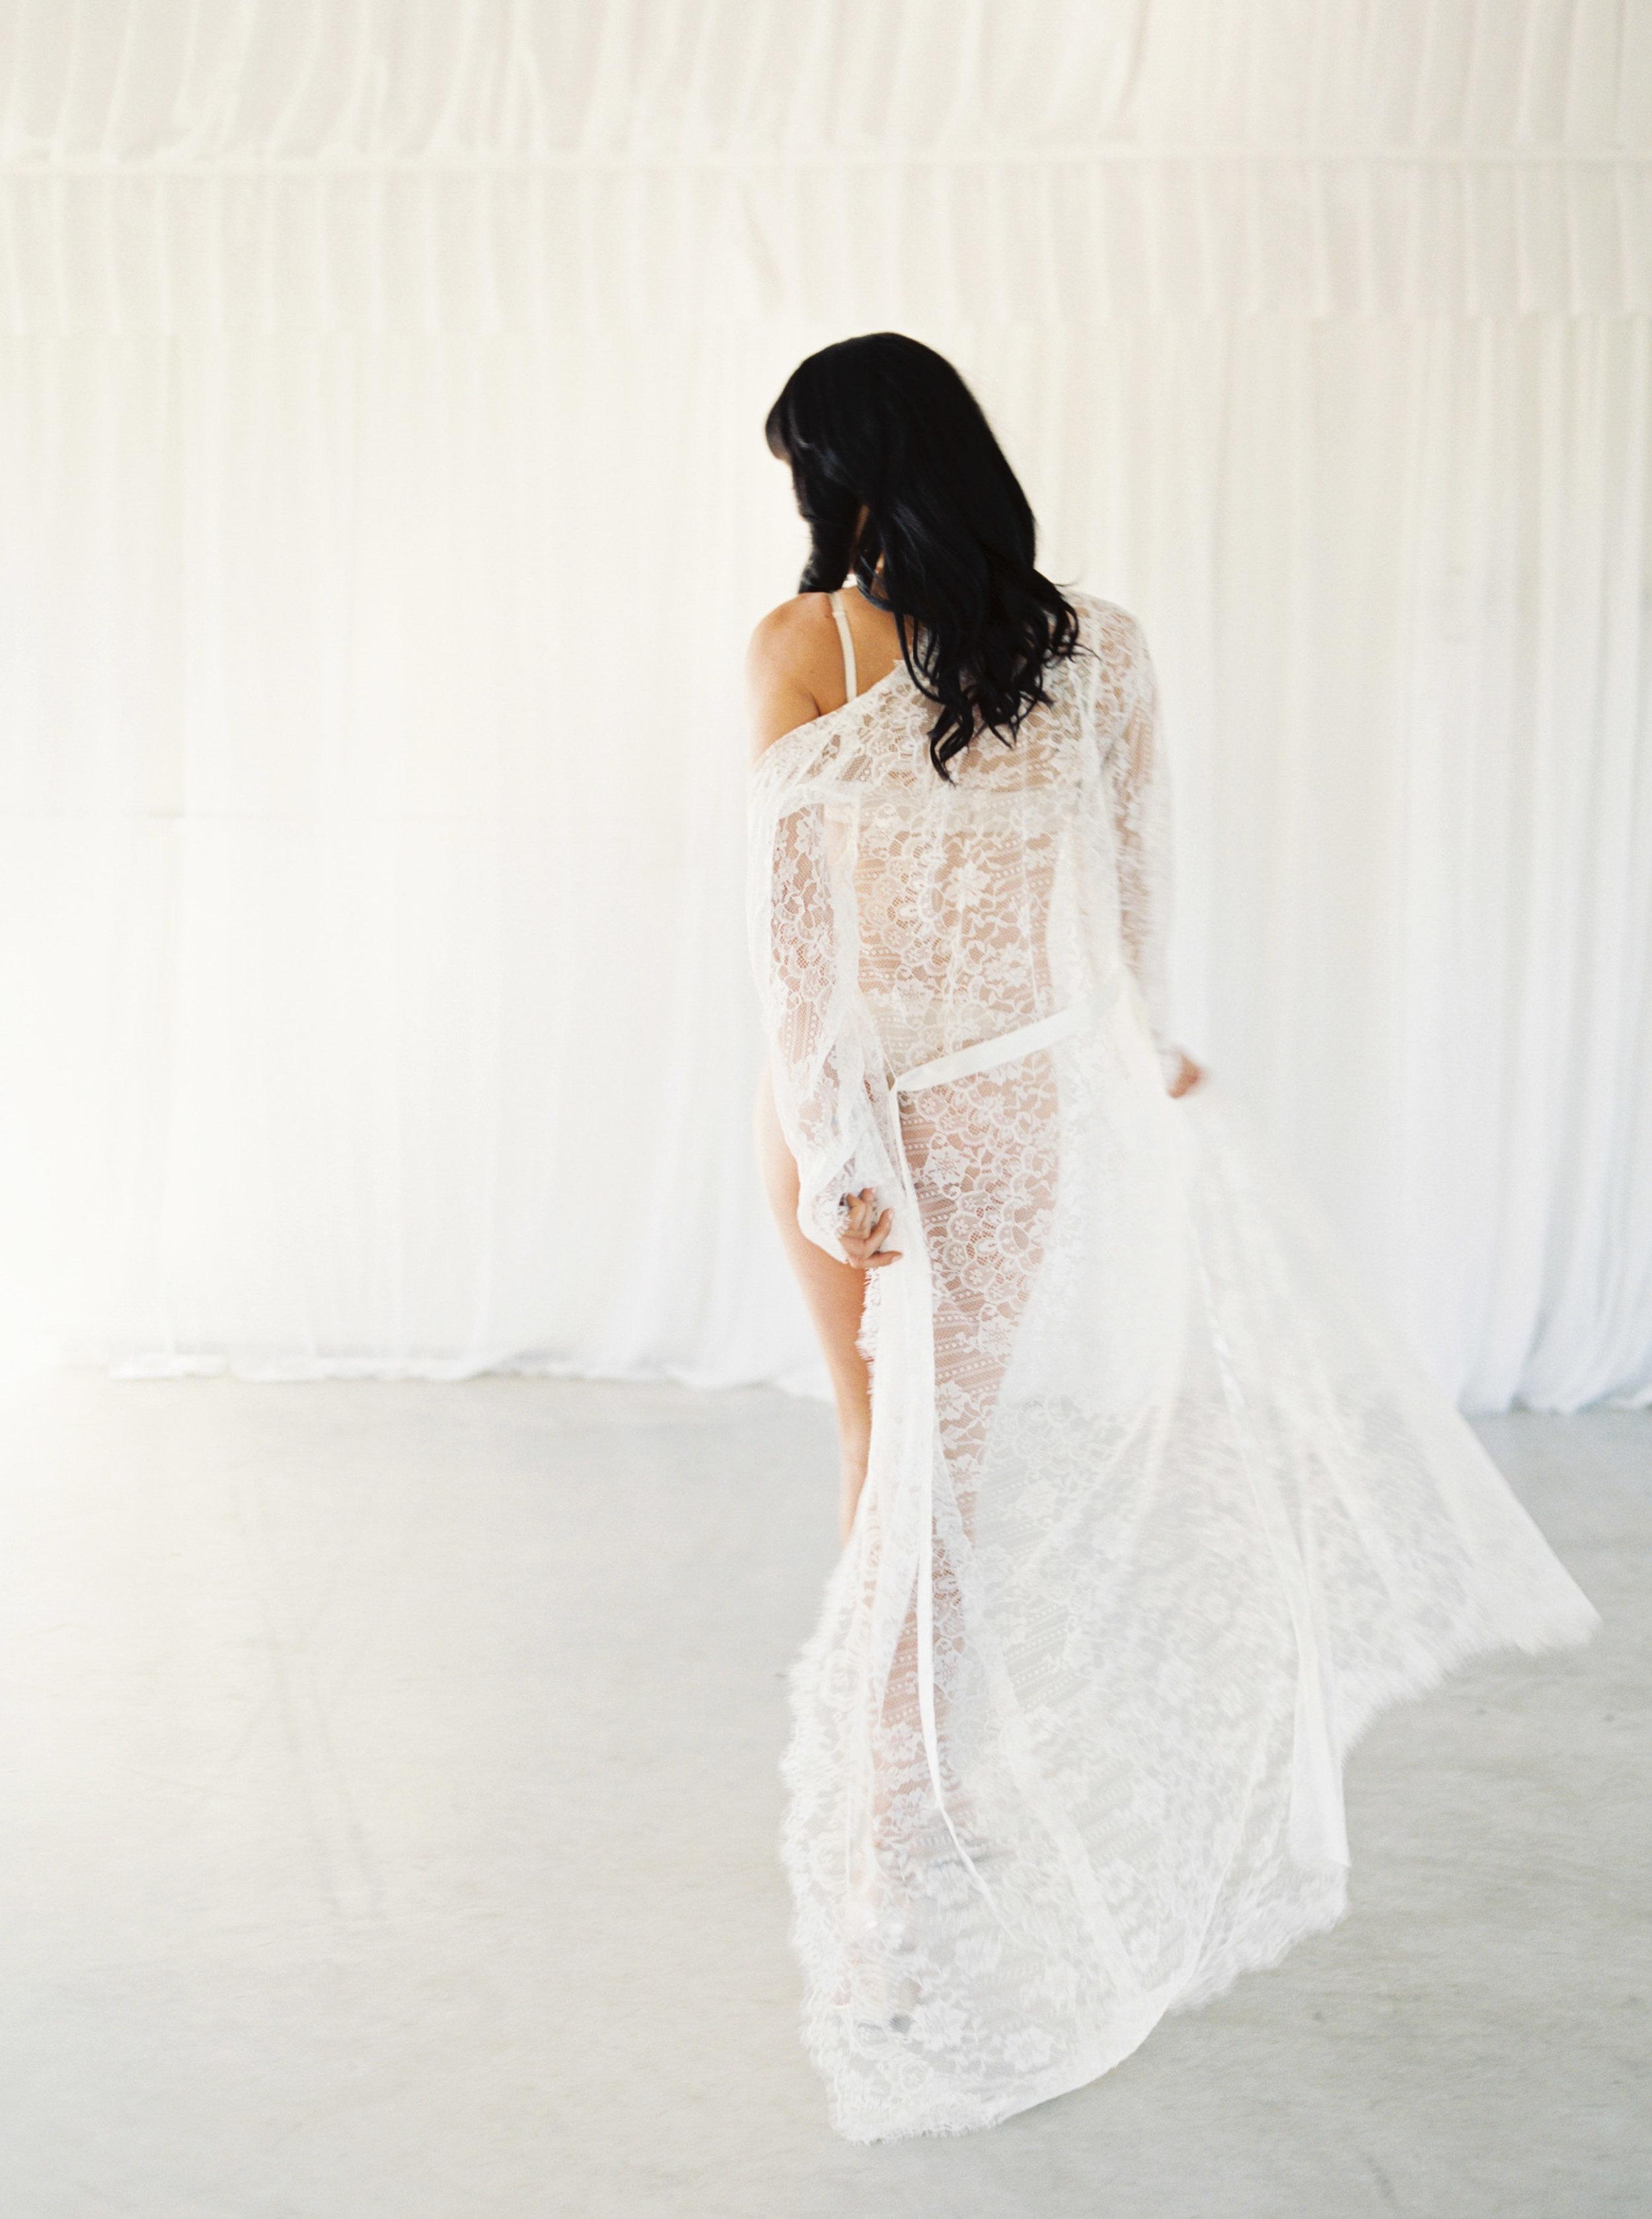 00007- Mudgee Wedding Photographer Sheri McMahon.jpg